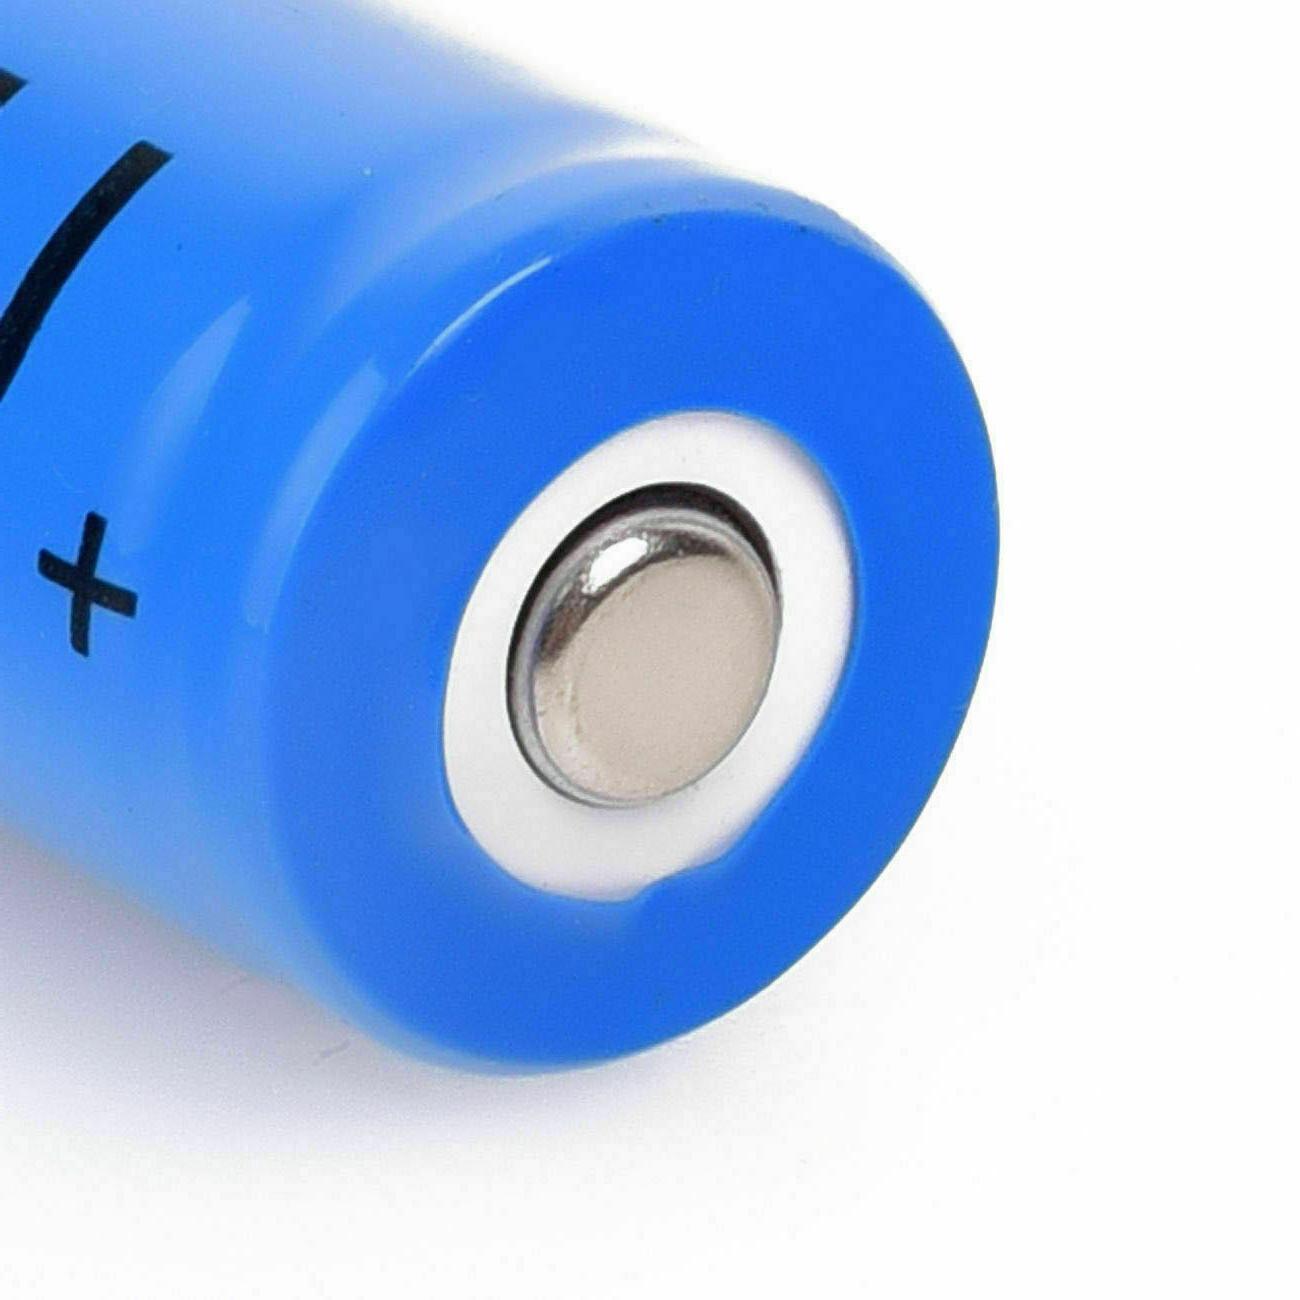 UltraFire 18650 Battery Li-ion 3.7V LED Flashlight